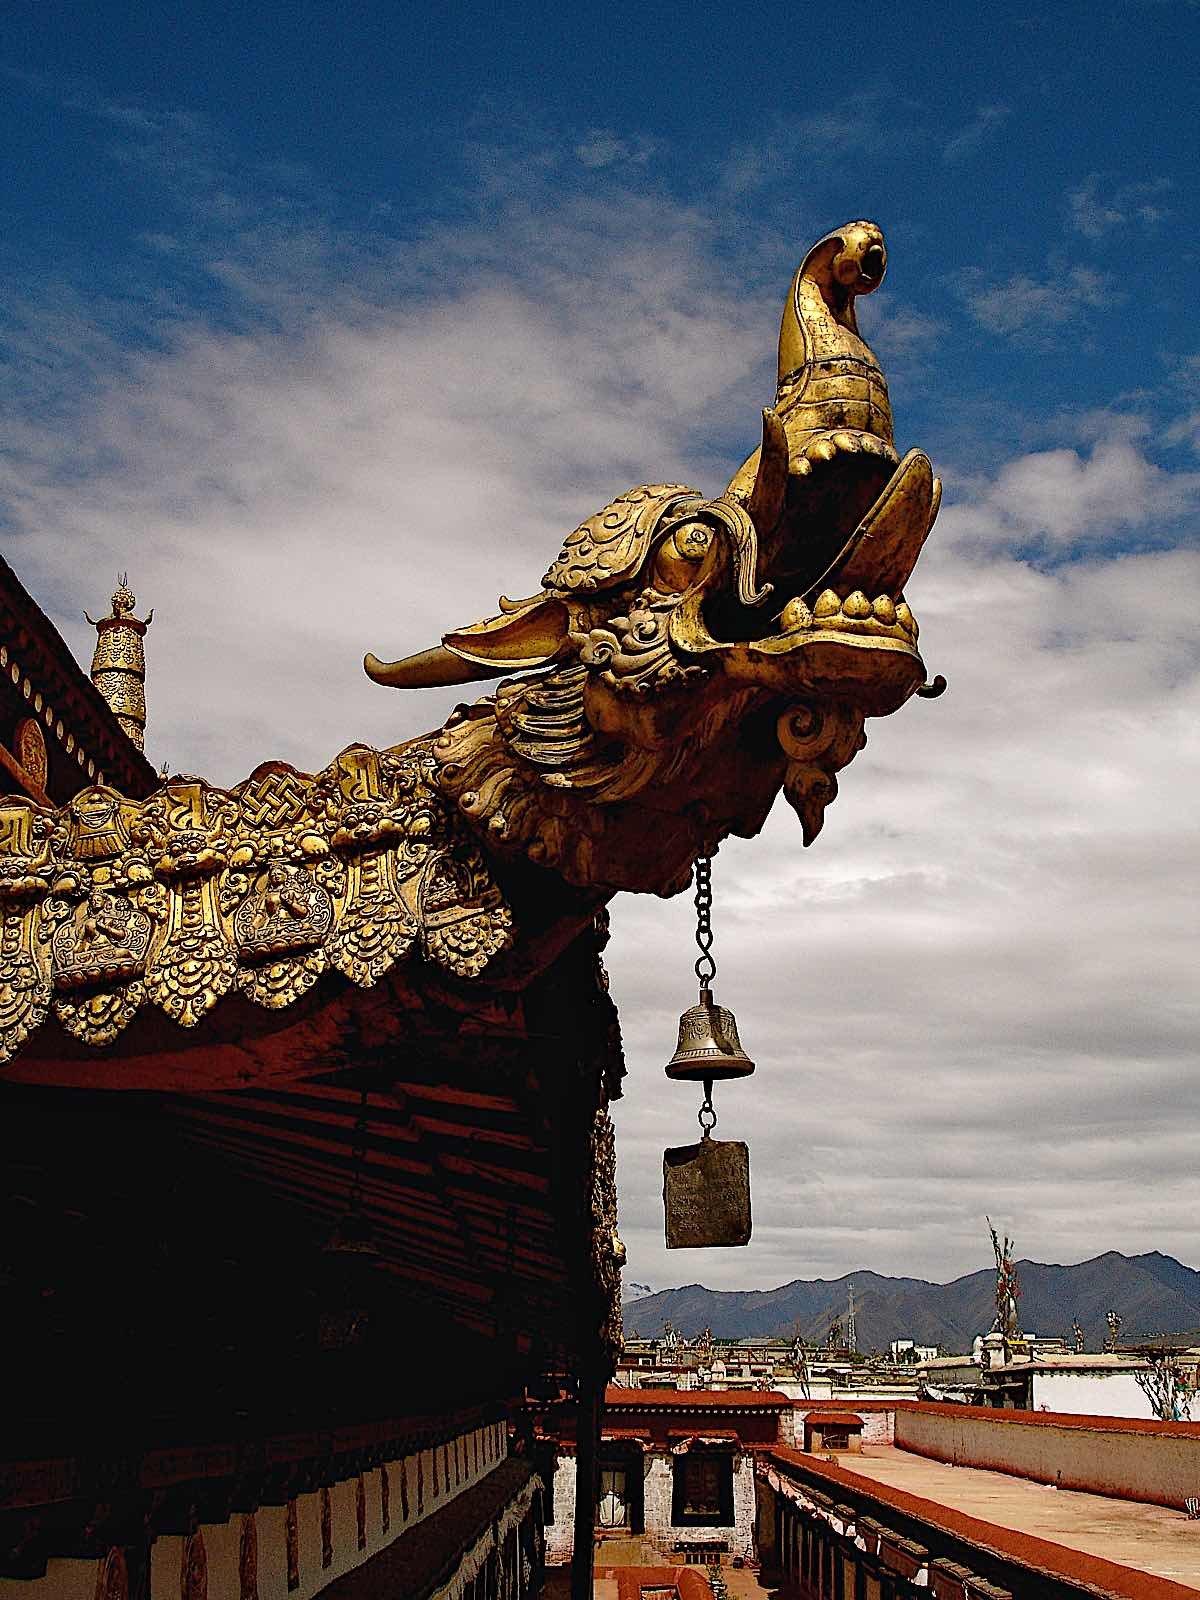 Buddha Weekly Tibetan Dragon Finial temple in Lhasa Tibet dreamstime xxl 96822275 Buddhism